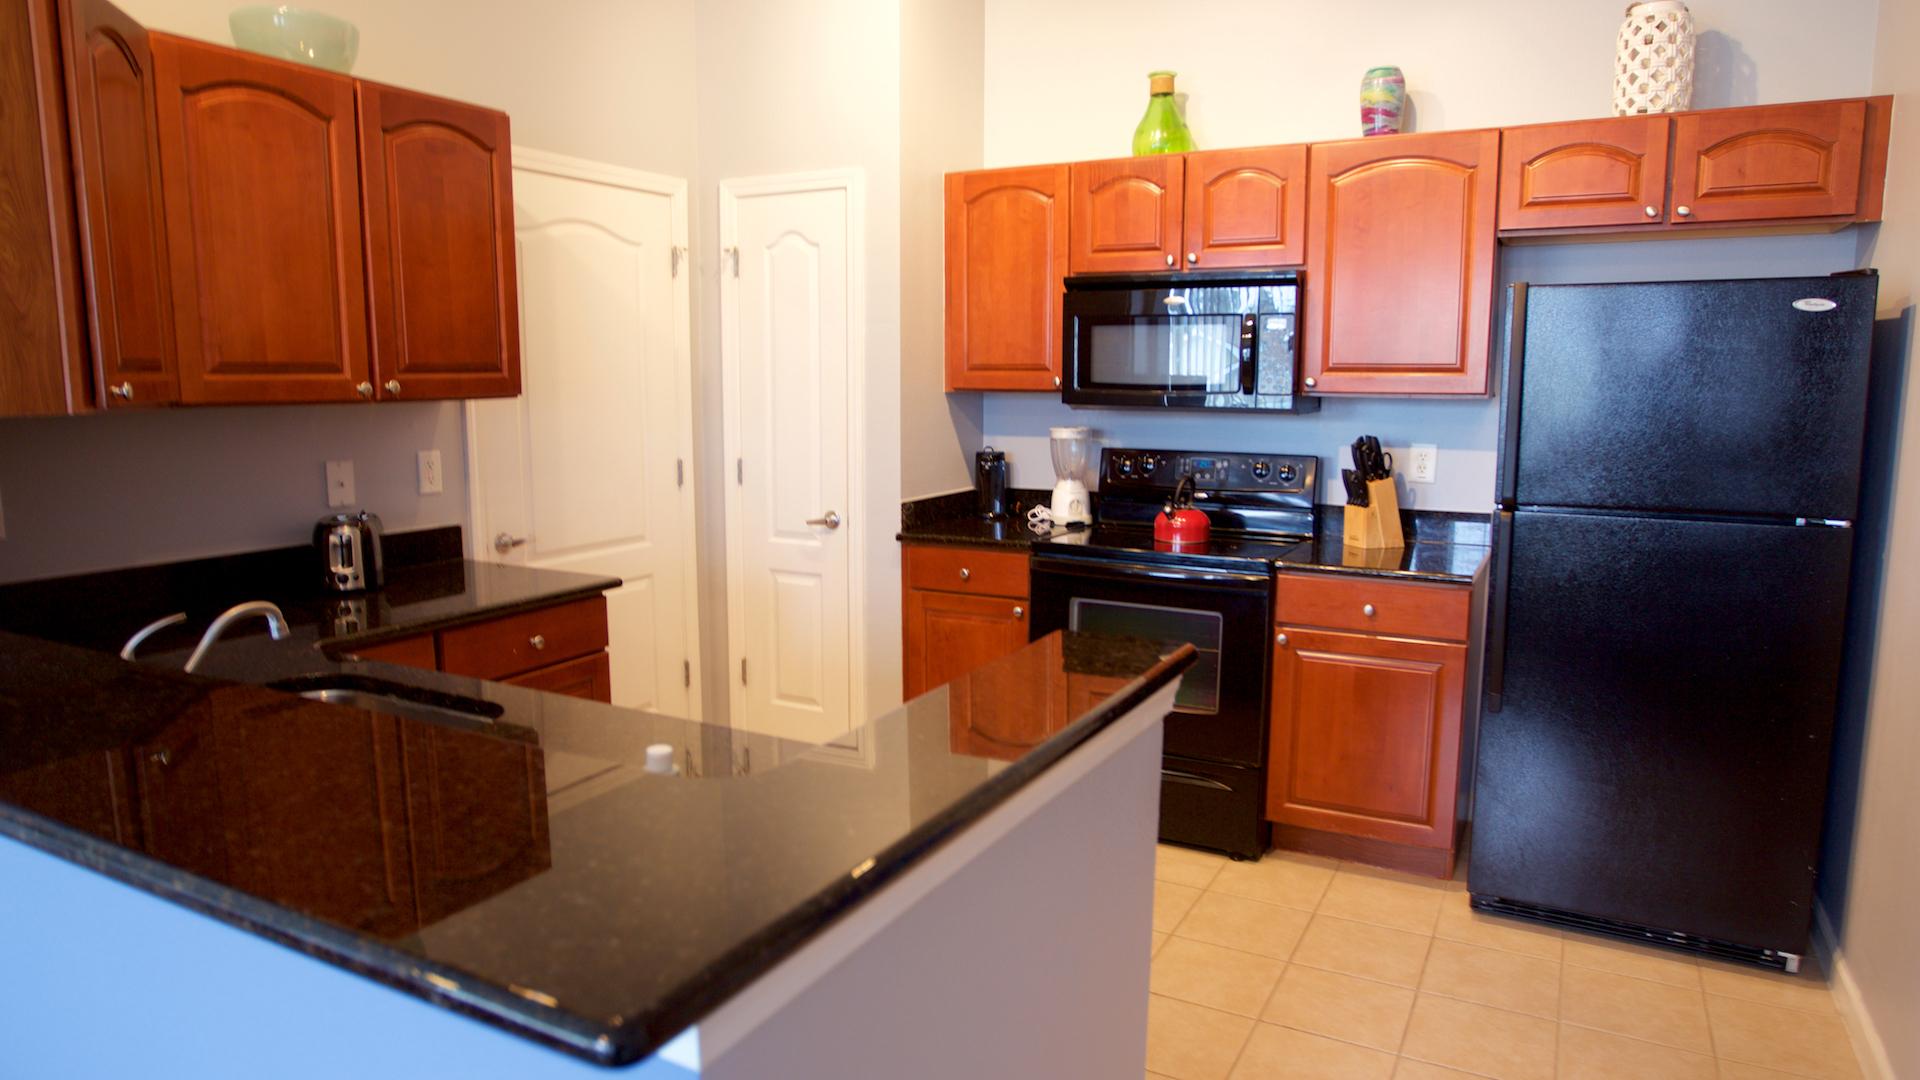 Apartment Cayman Condo at Cane Island Resort photo 25857796